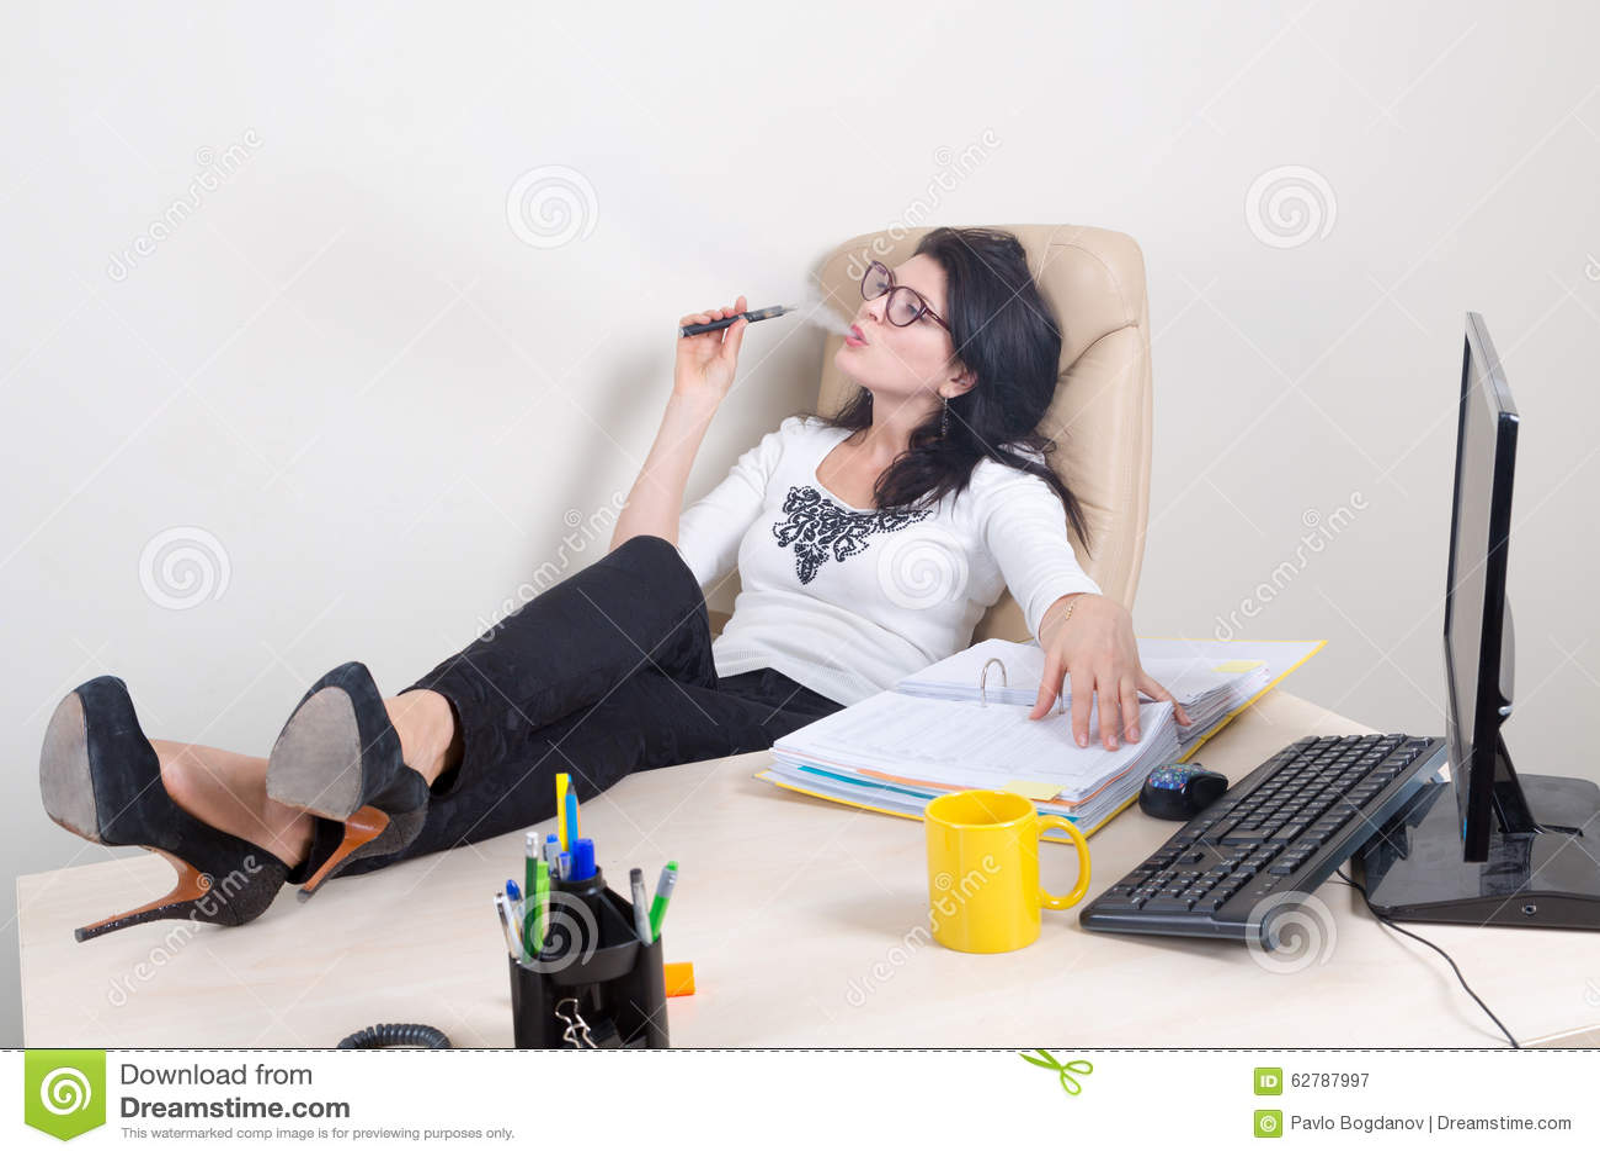 how to become a successful executive secretary